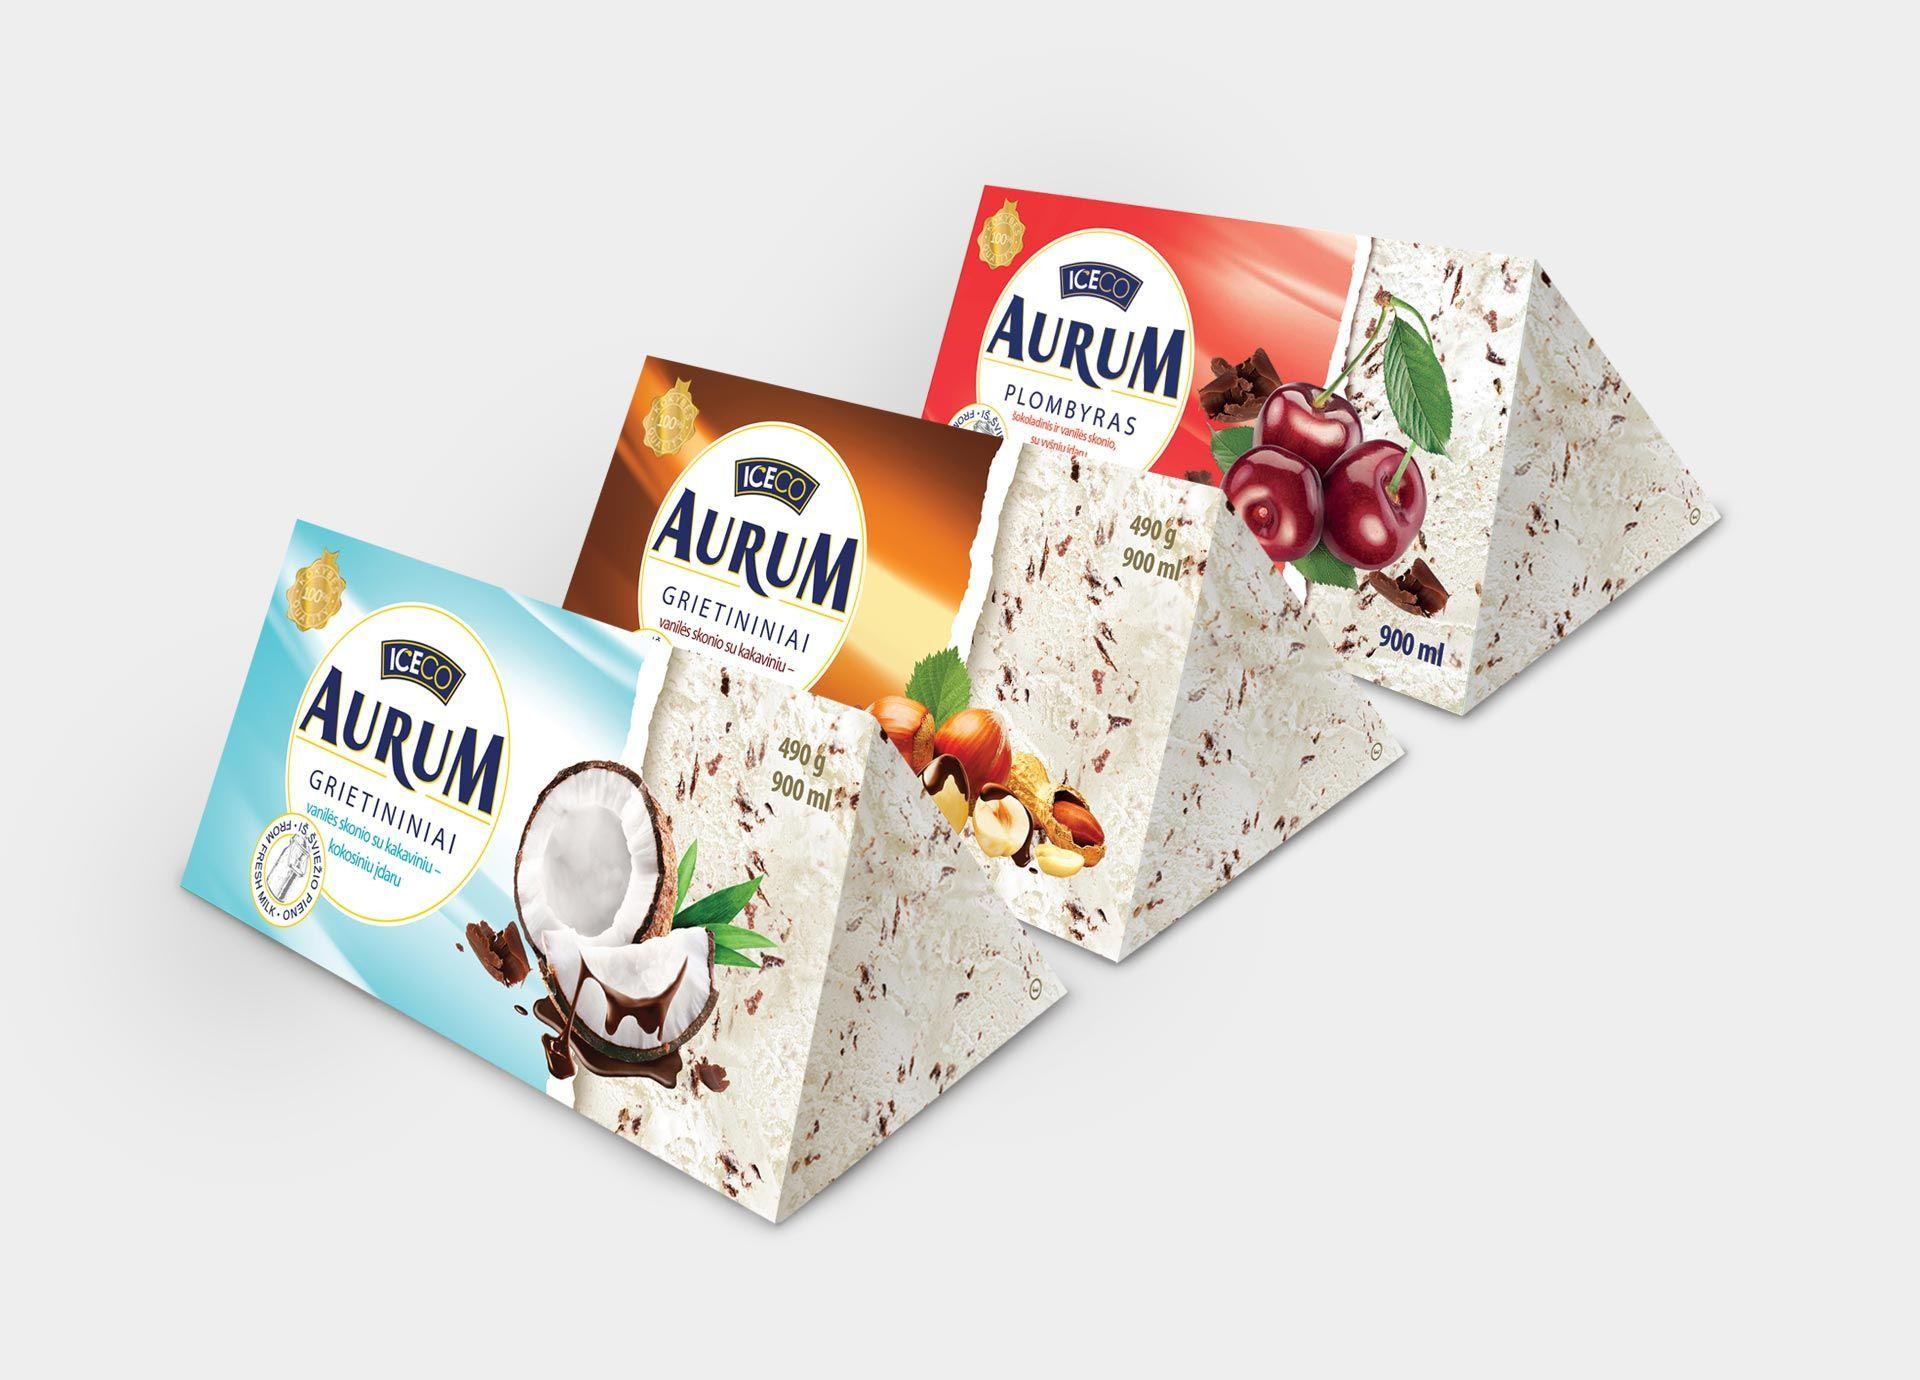 Ice Cream Pint Label Template Unique Ice Cream Packaging Design Advision Packages Advision Ice Cream Packaging Ice Cream Packaging Design